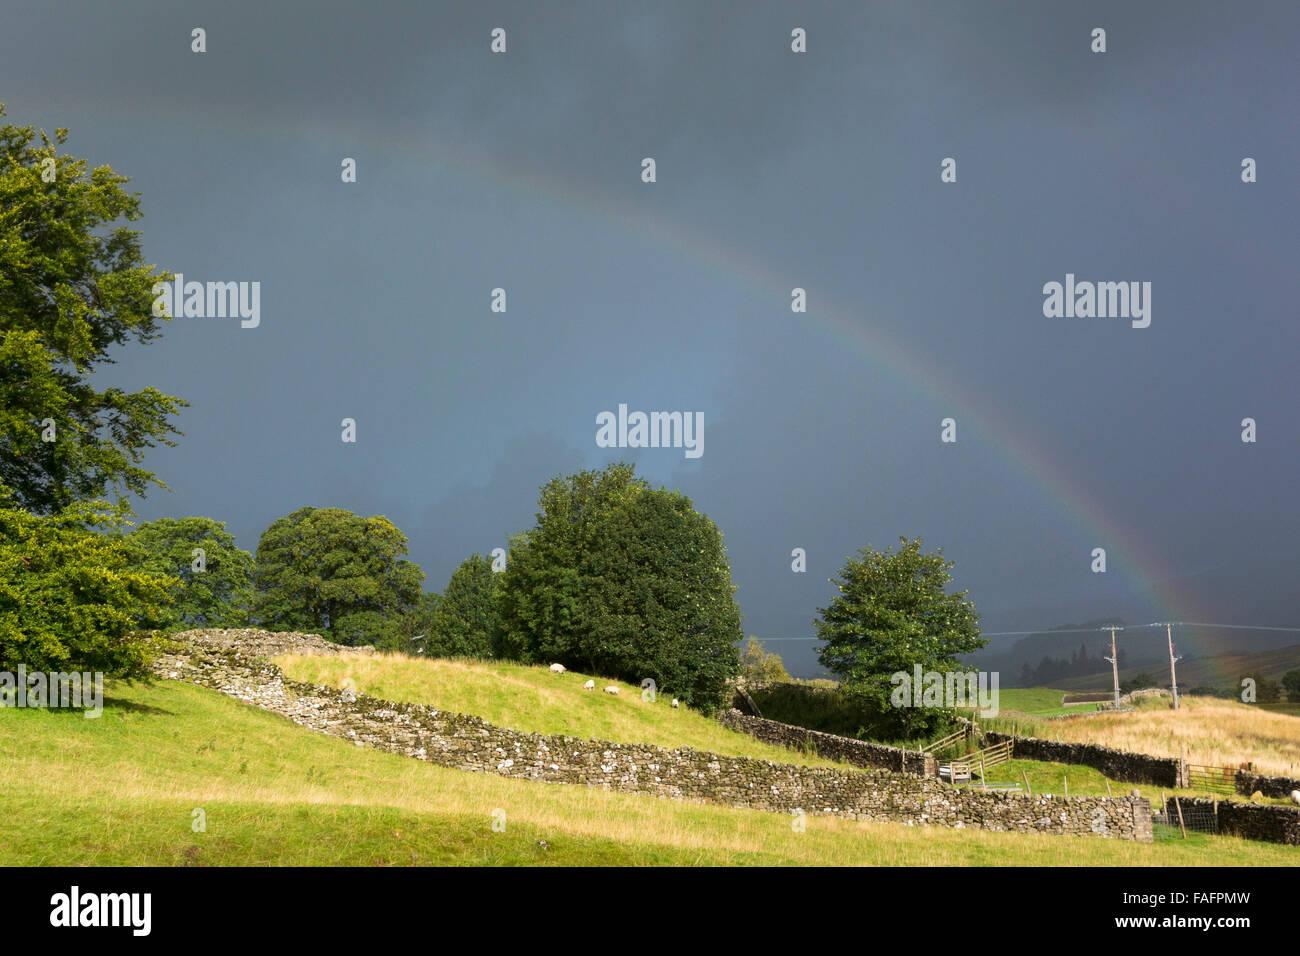 Rainbow over farmland in Wensleydale, near Hawes, North Yorkshire, UK. - Stock Image